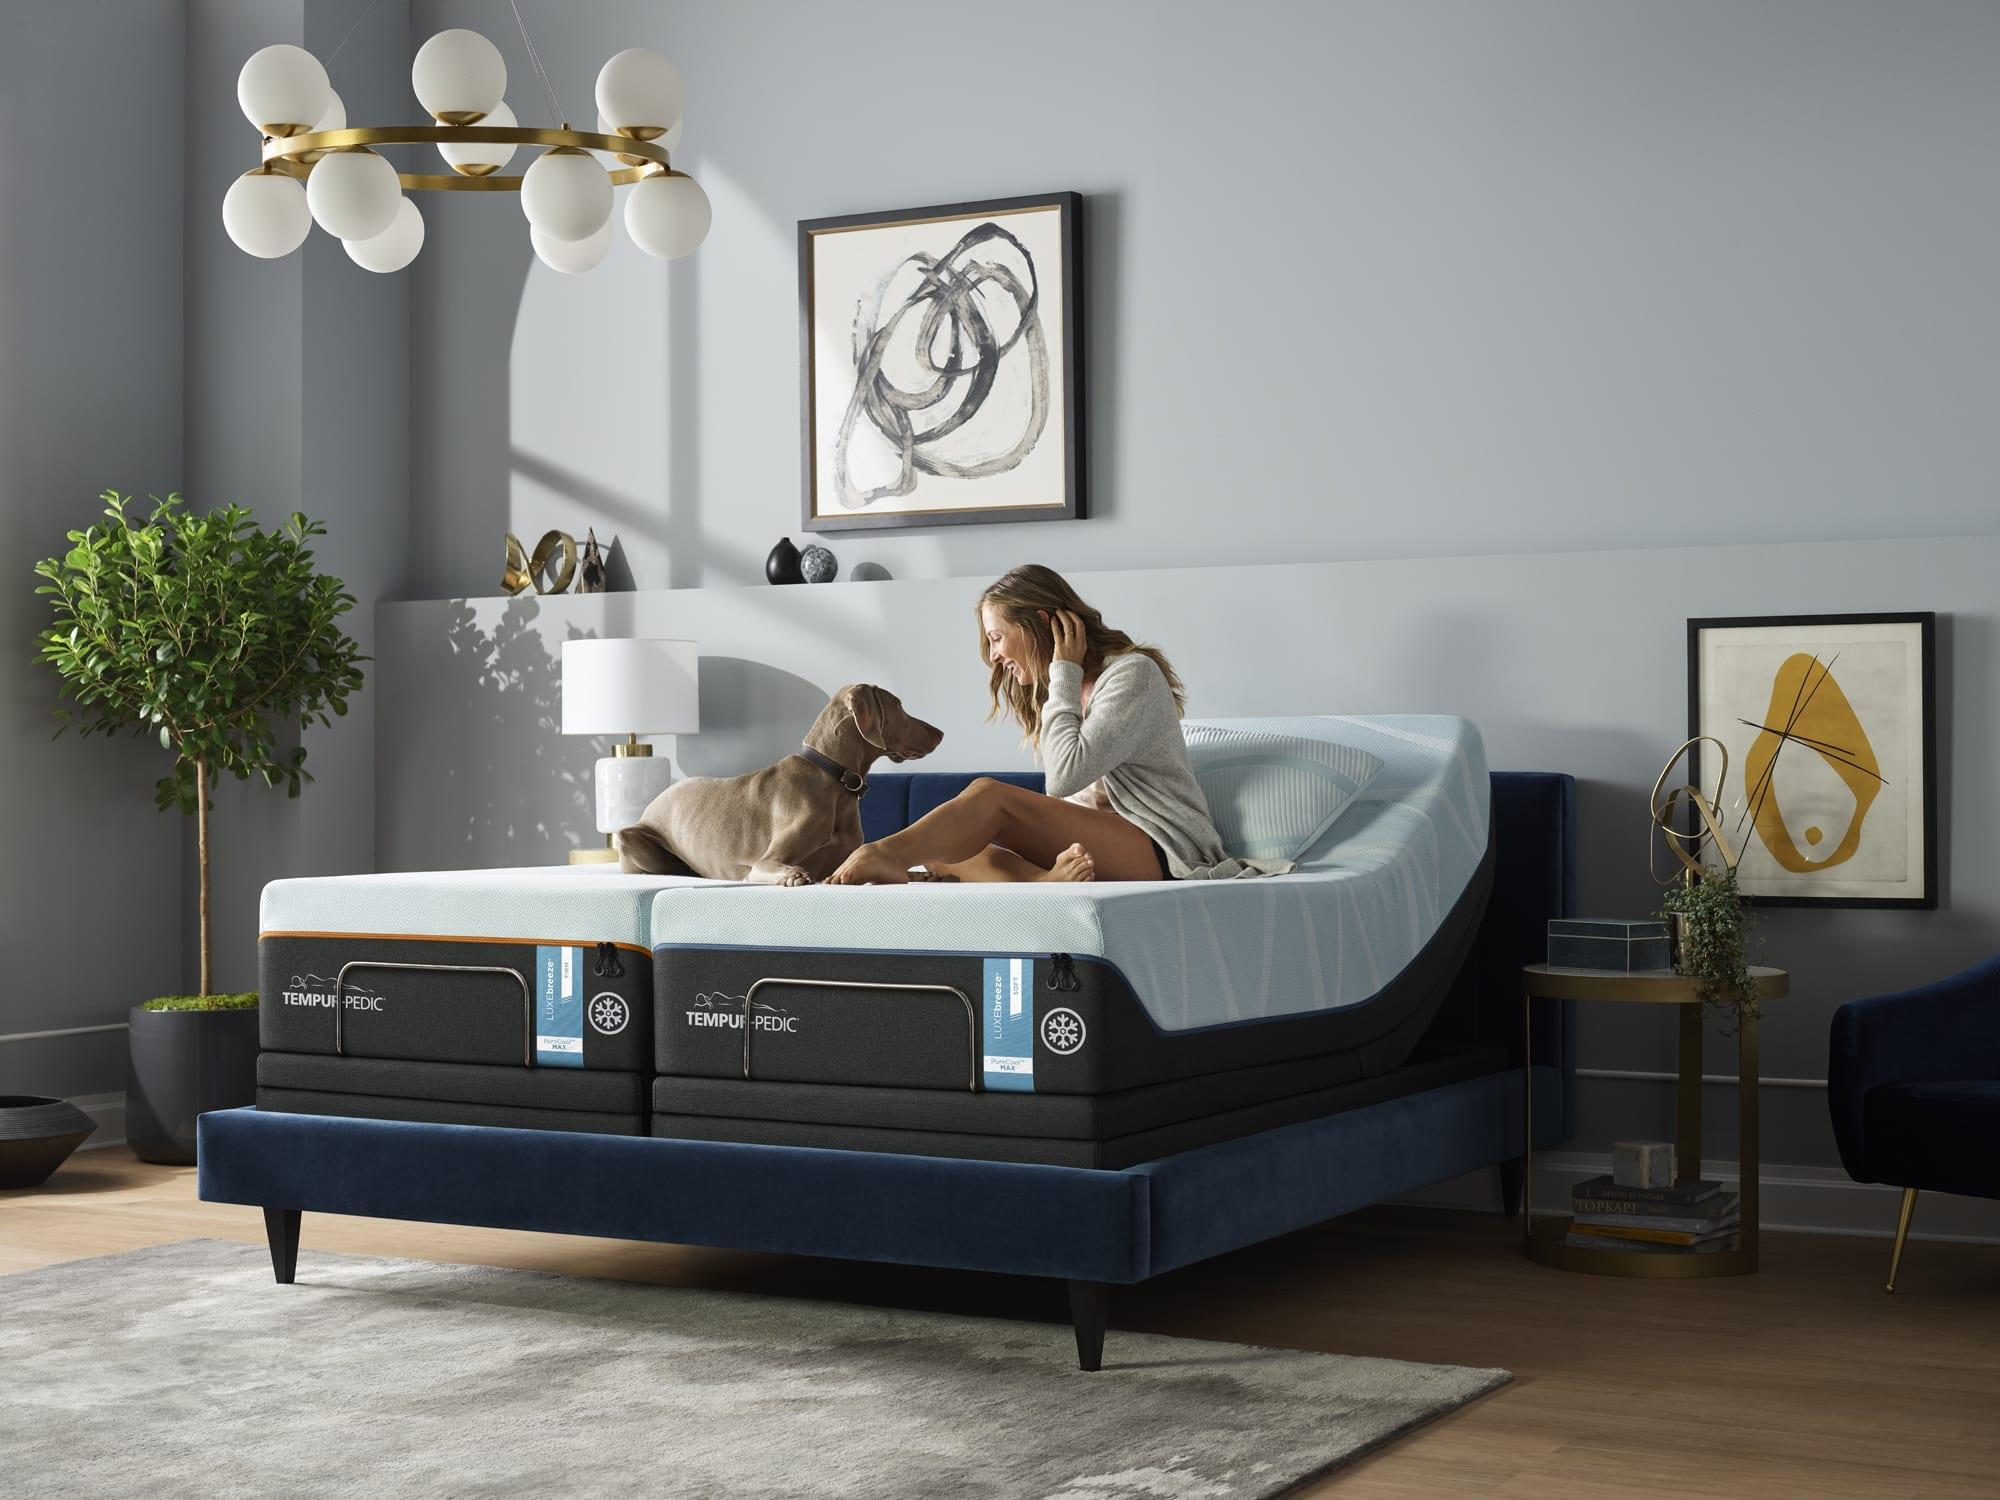 A new Tempur-Pedic mattress and adjustable bed.